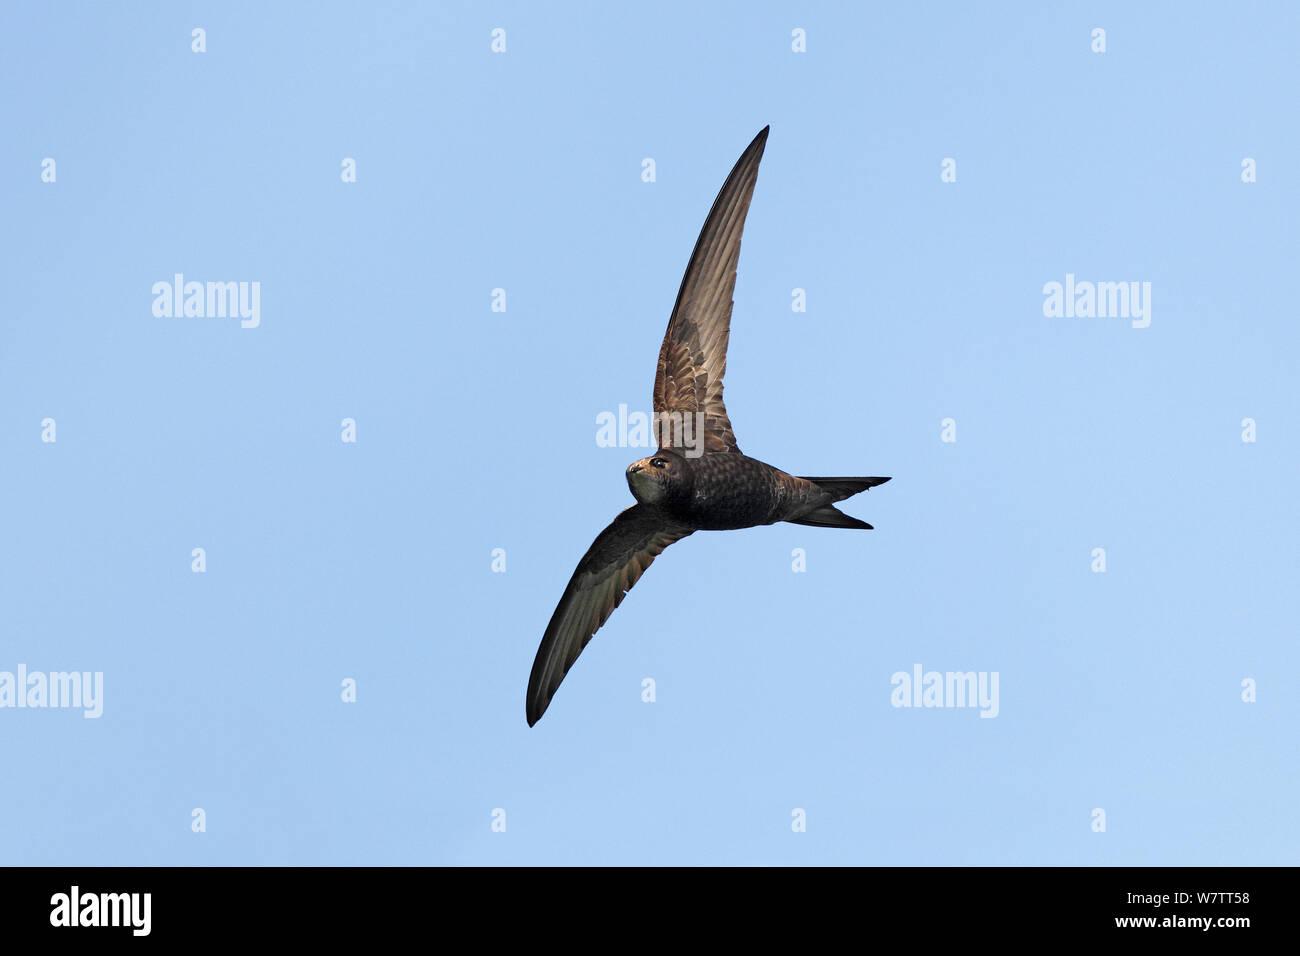 Common Swift (Apus apus) in flight, Wirral, Merseyside, UK, July. Stock Photo